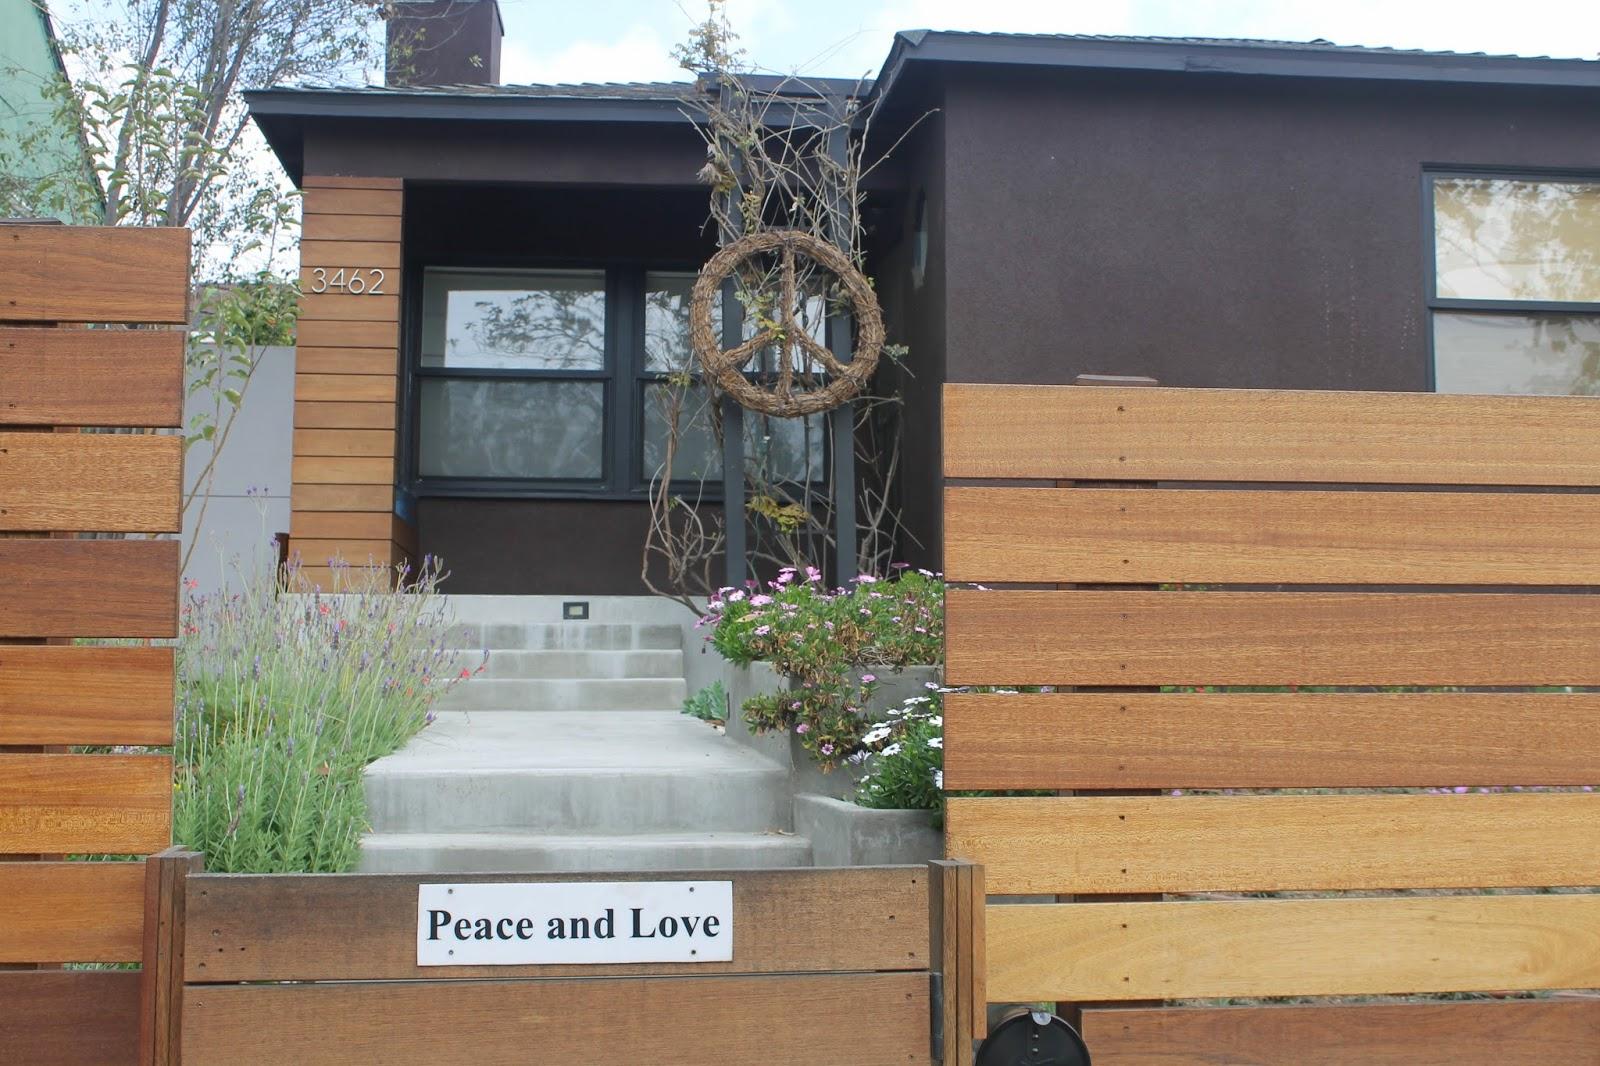 mar vista green garden showcase 3462 beethoven street cluster 4b